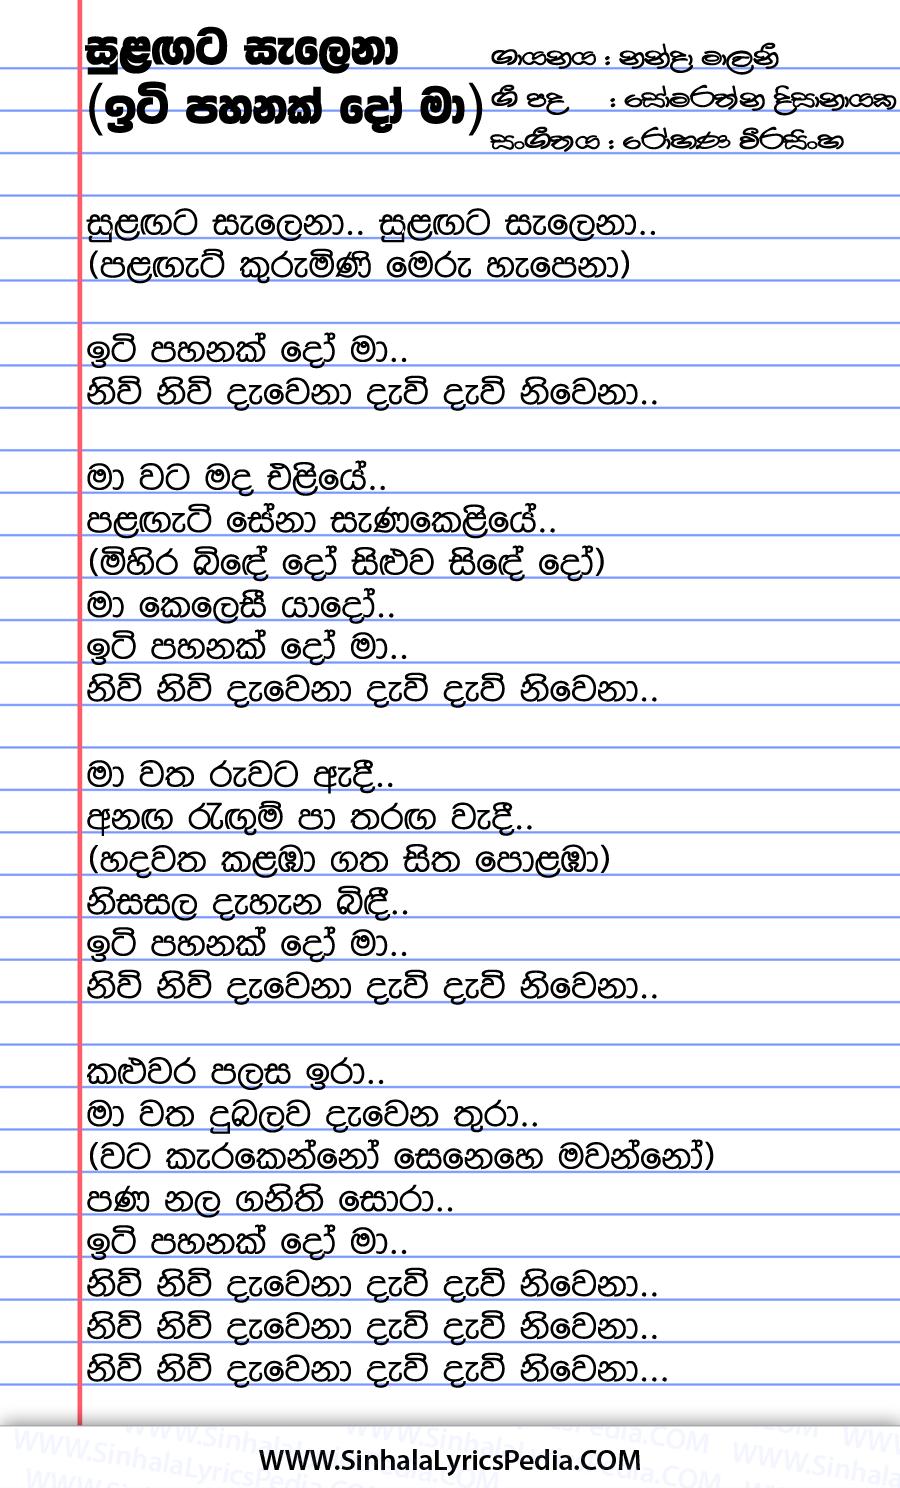 Sulangata Selena (Iti Pahanak Drama Theme Song) Song Lyrics